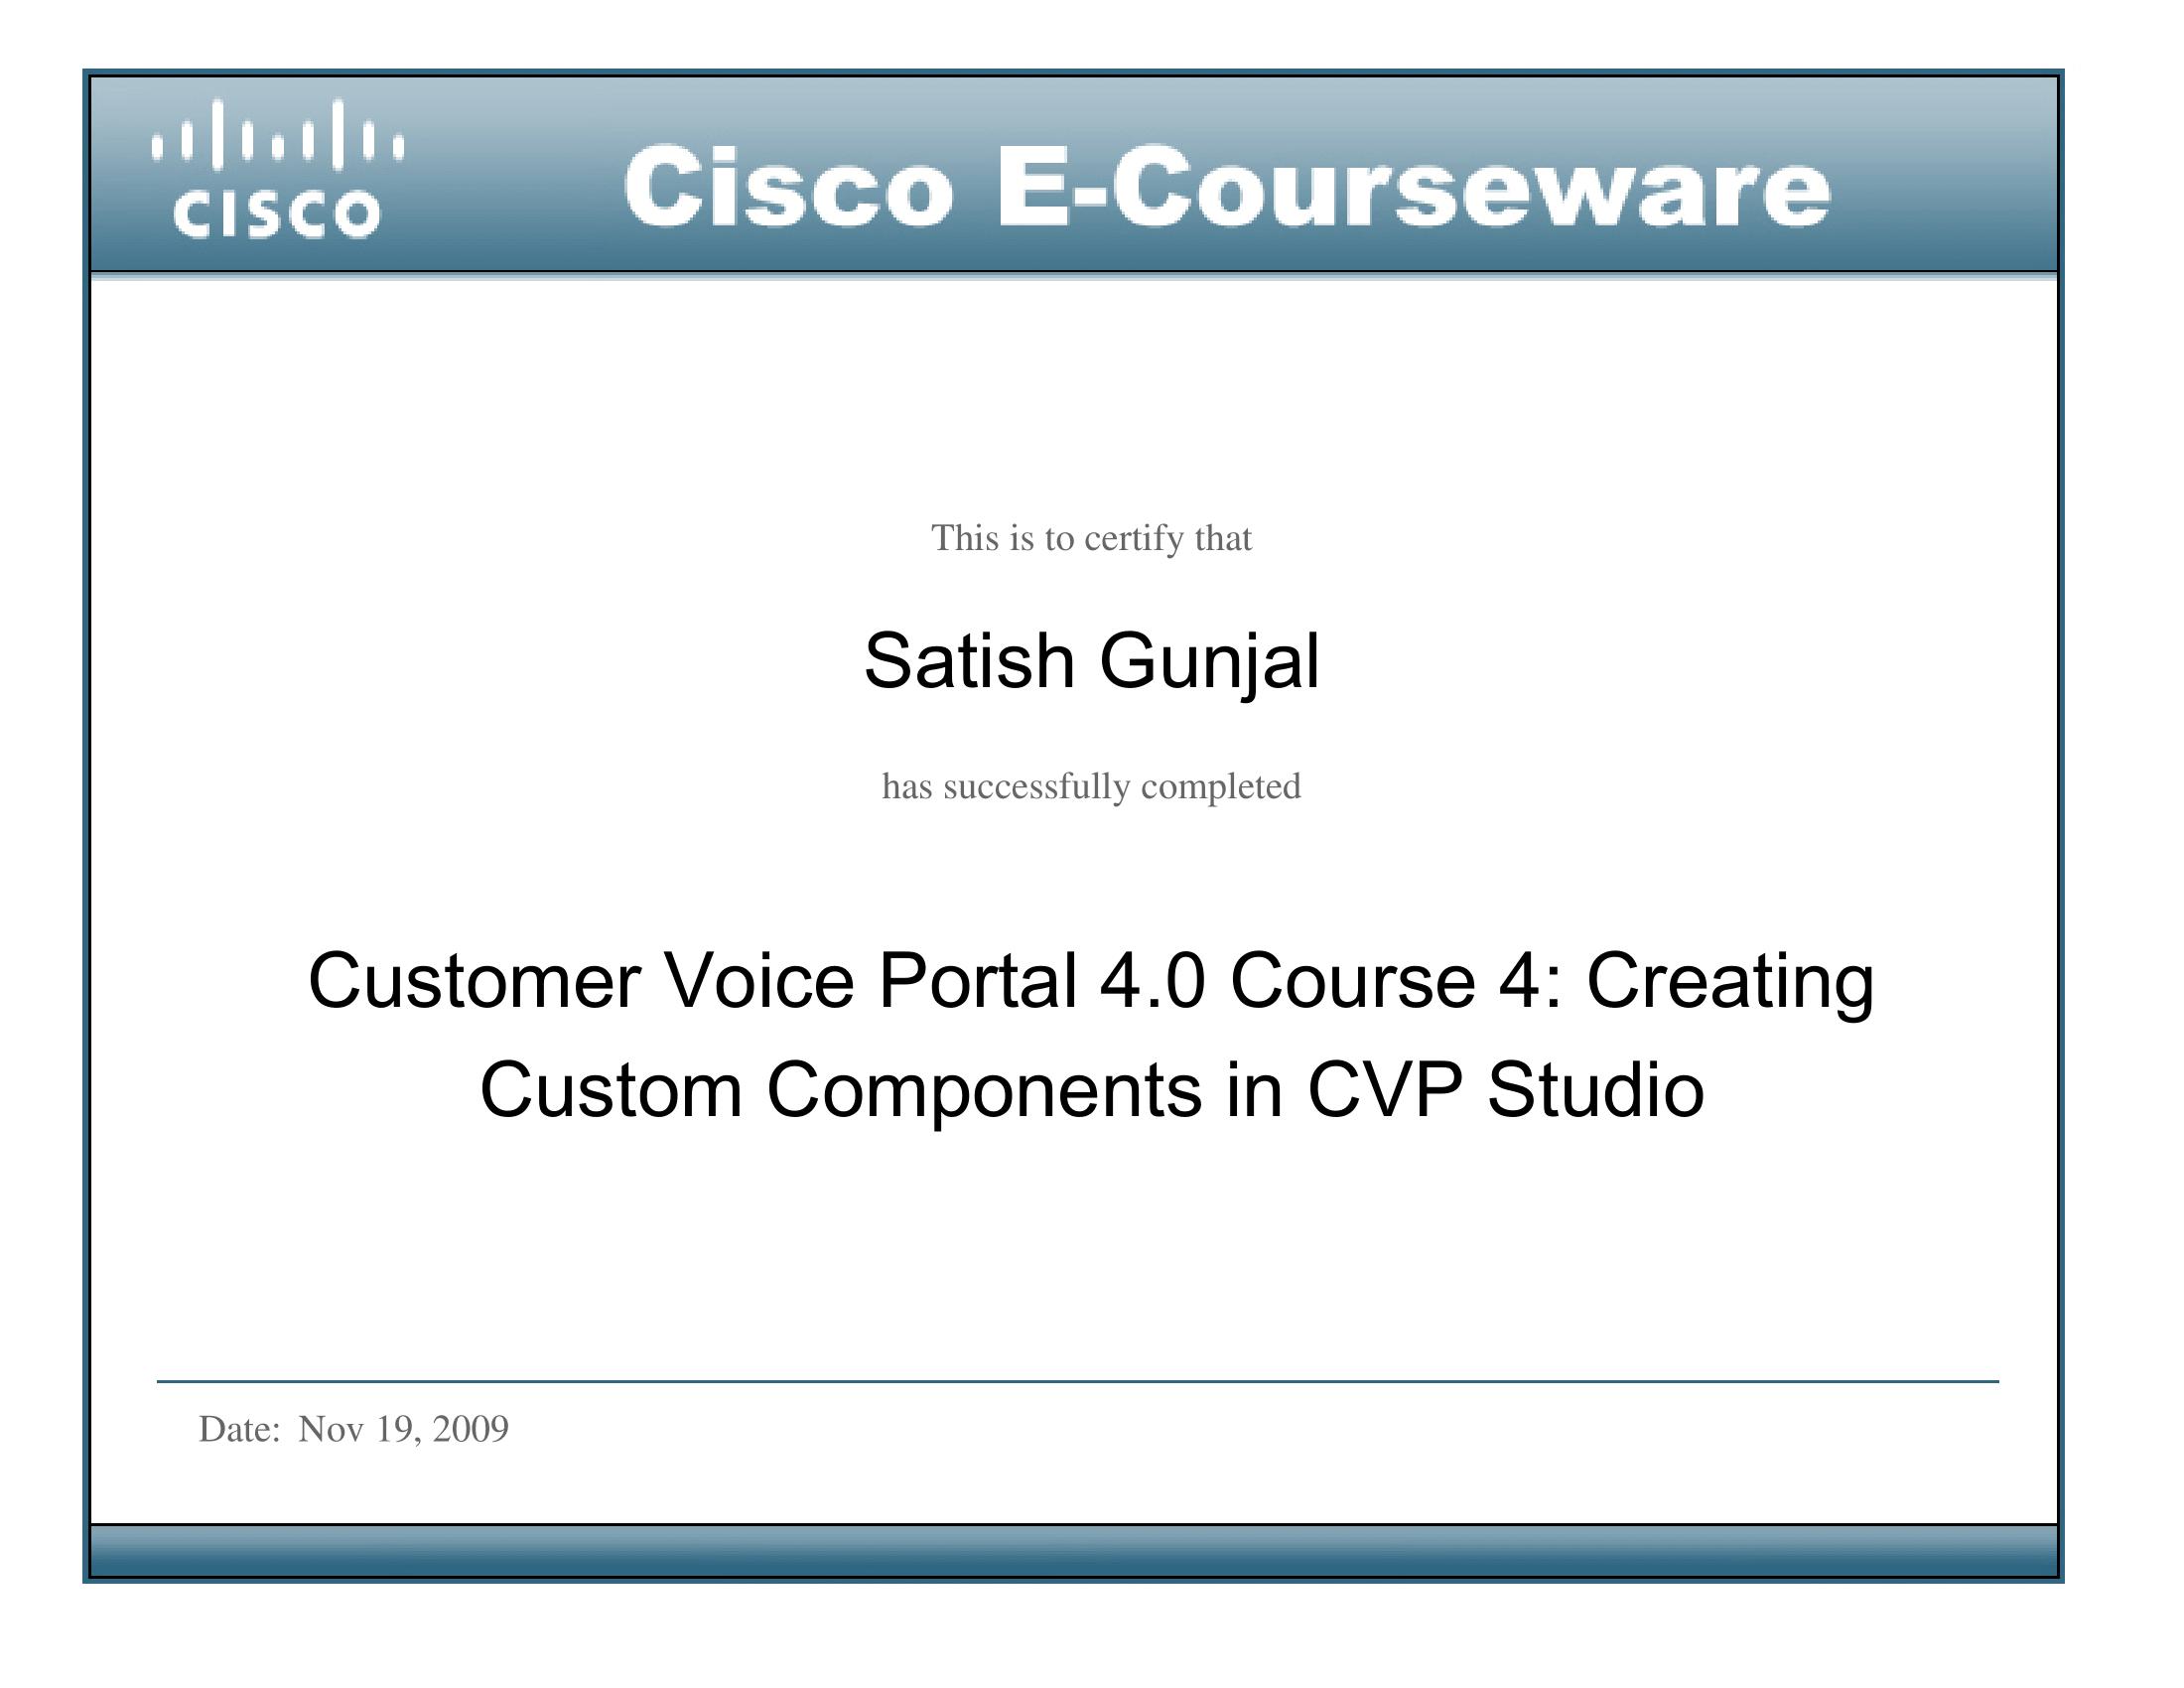 CVP 4.0 Course 4 Creating Custom Components in CVP Studio